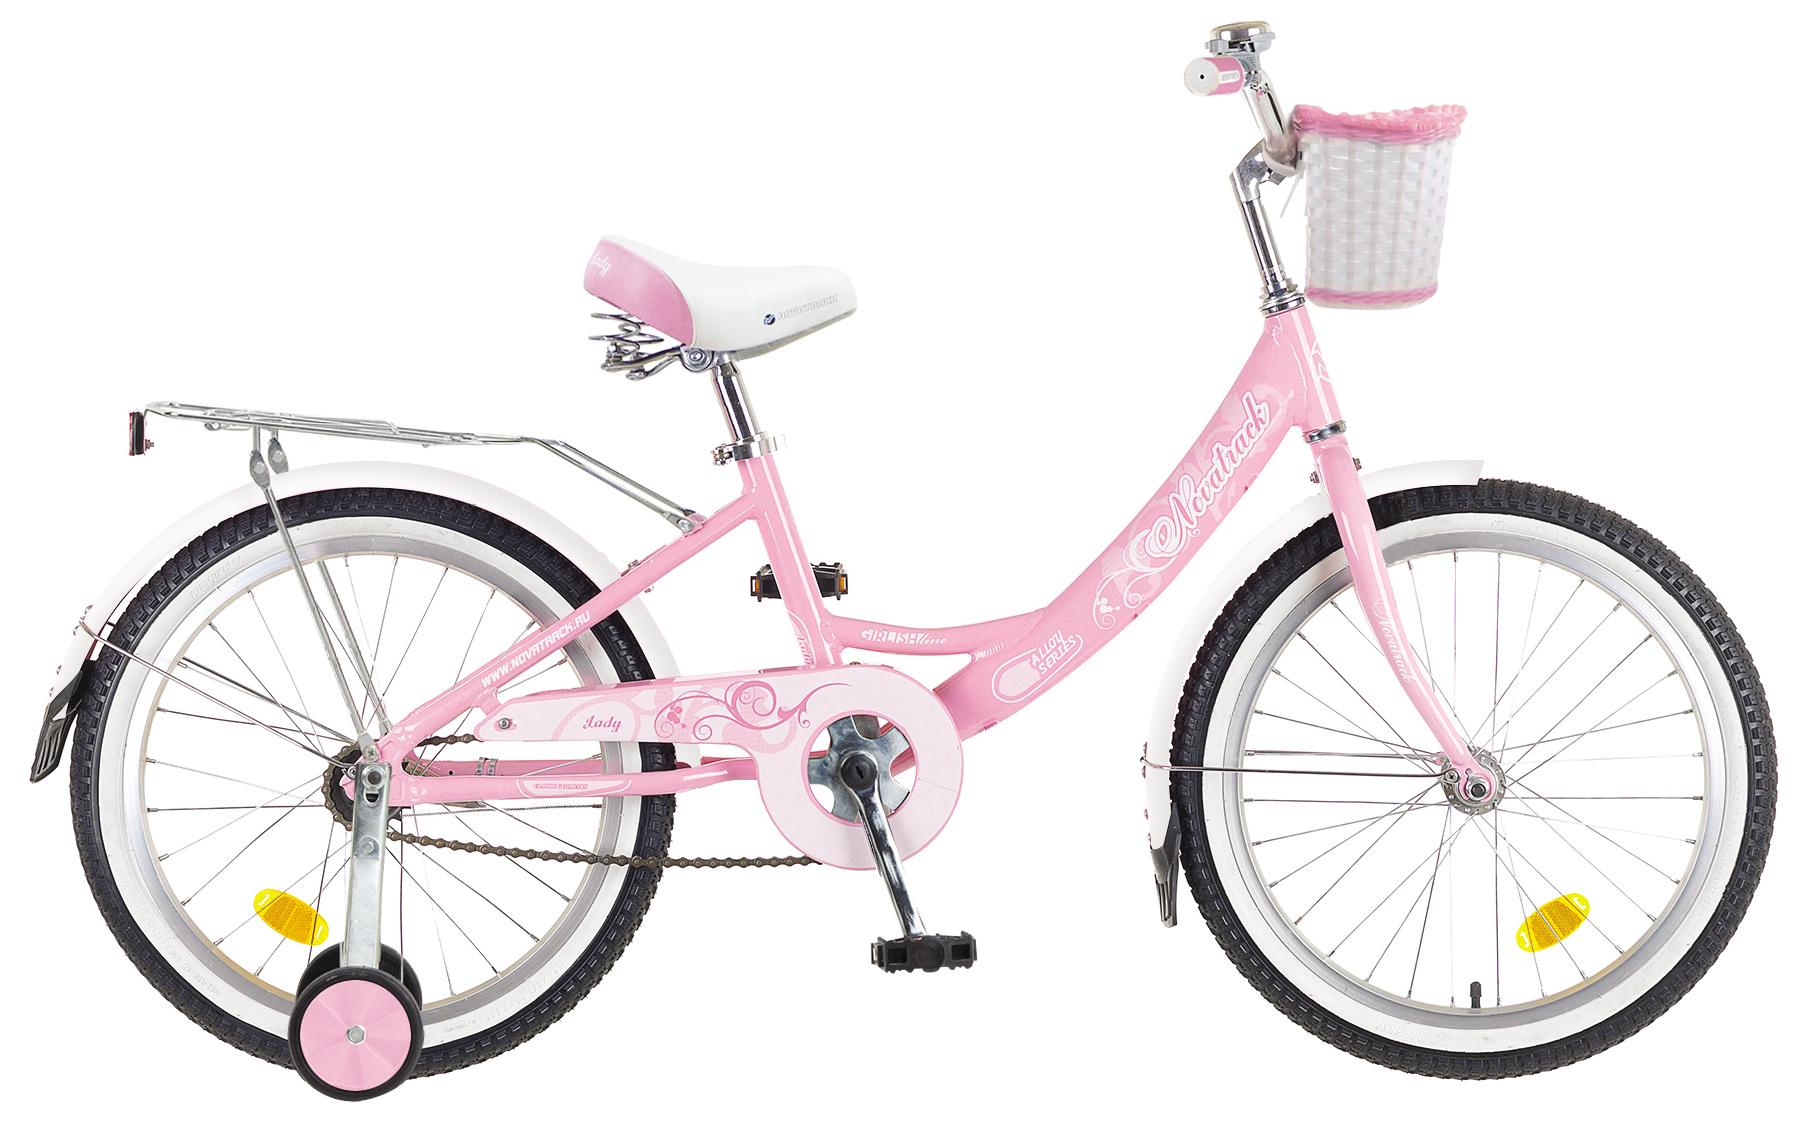 Велосипед Novatrack Girlish line 20 2019 велосипед novatrack girlish line 20 6 speed 2015